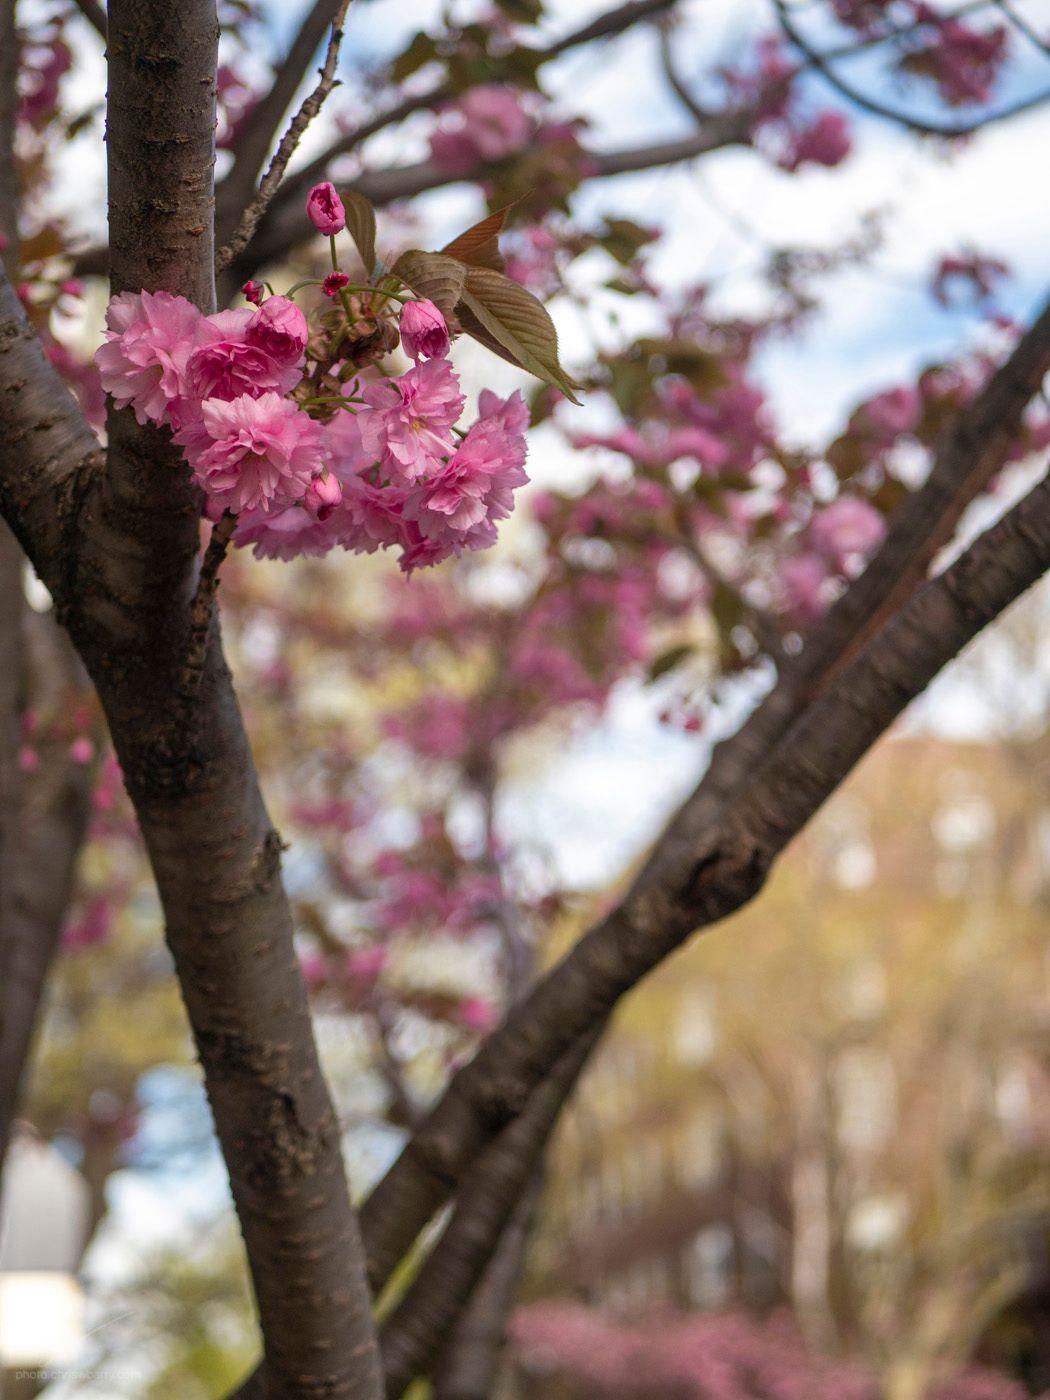 4-22-19: Cherry Blossoms